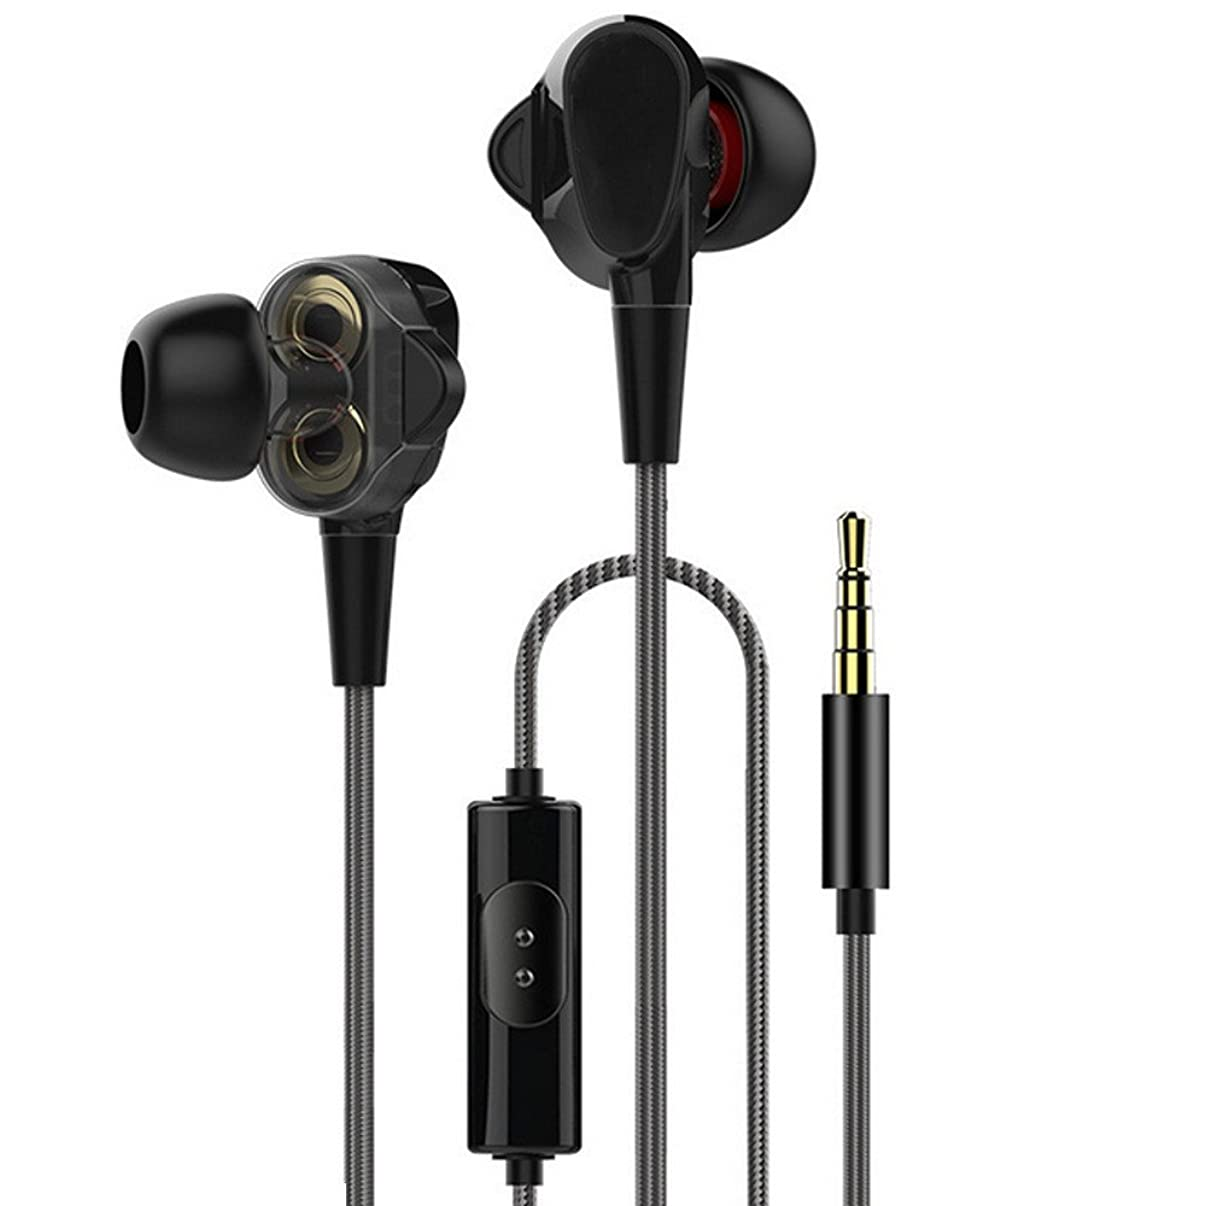 Headphone Earphones,HIFI Earphone Dual Dynamic Driver Headphone Super Bass Stereo Headset With Mic,Drums & Percussion,Black,Clearance Sale